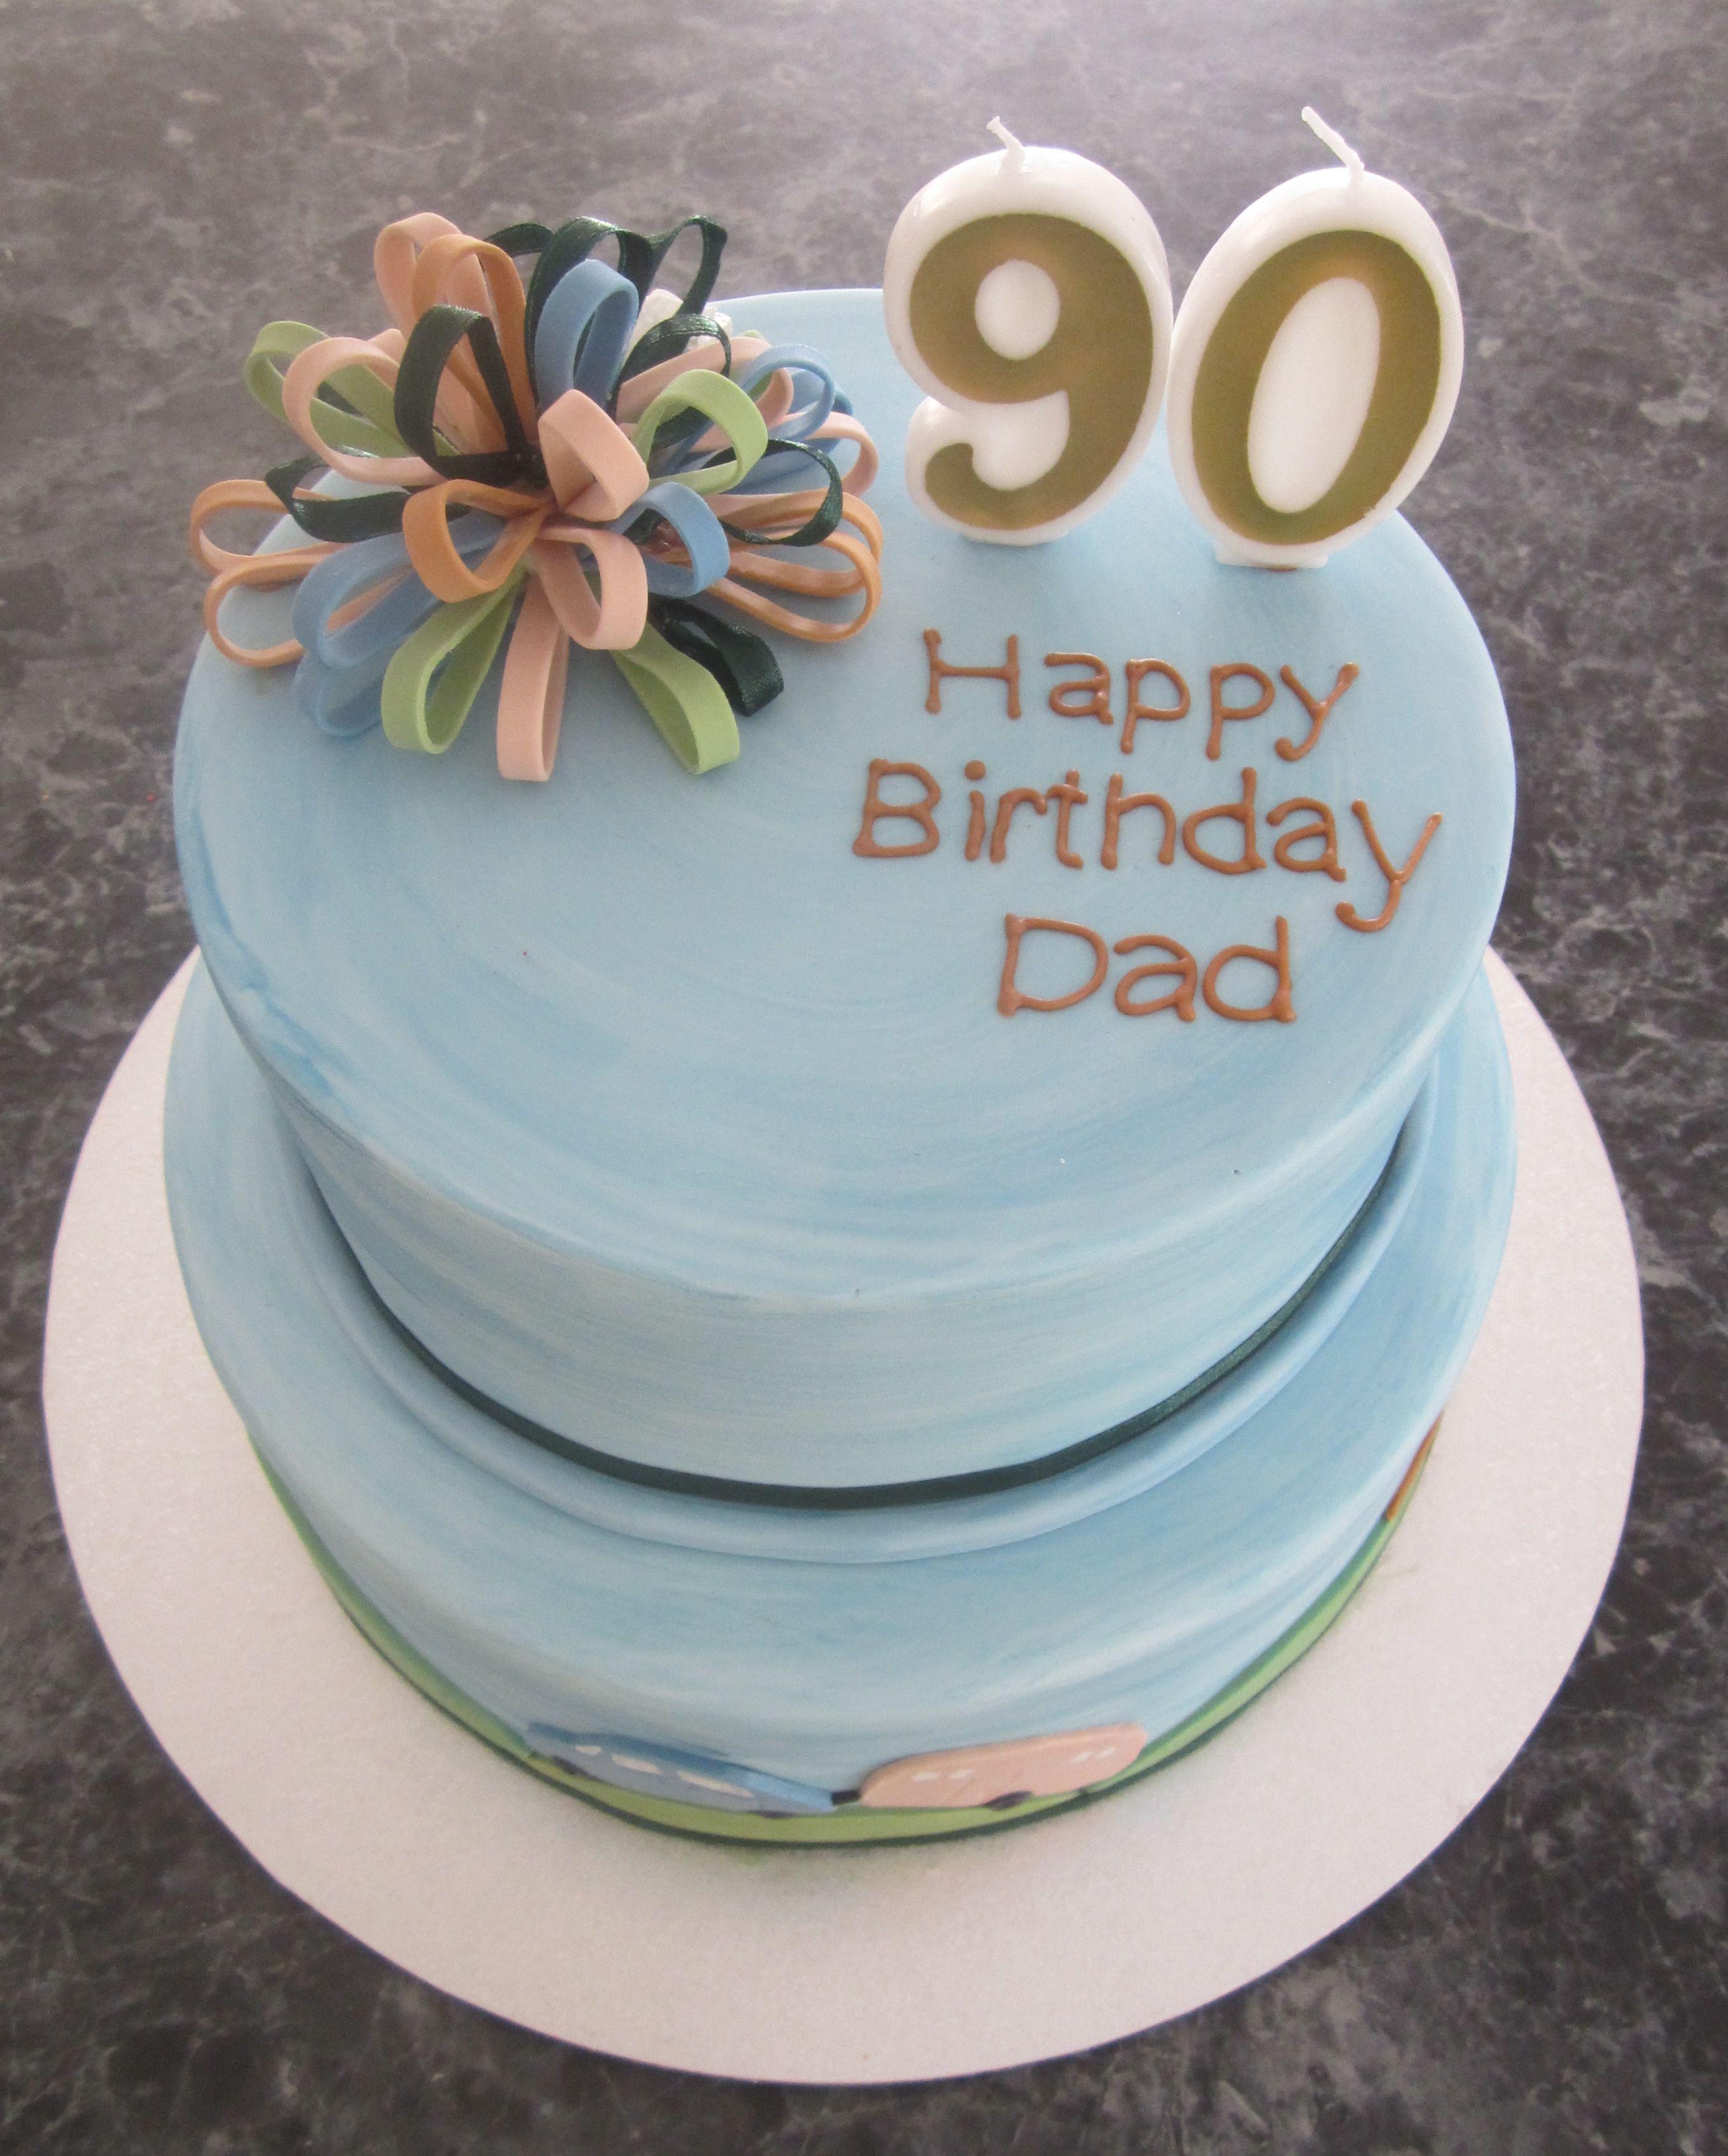 90th Birthday Cakes 40th Birthday Cake